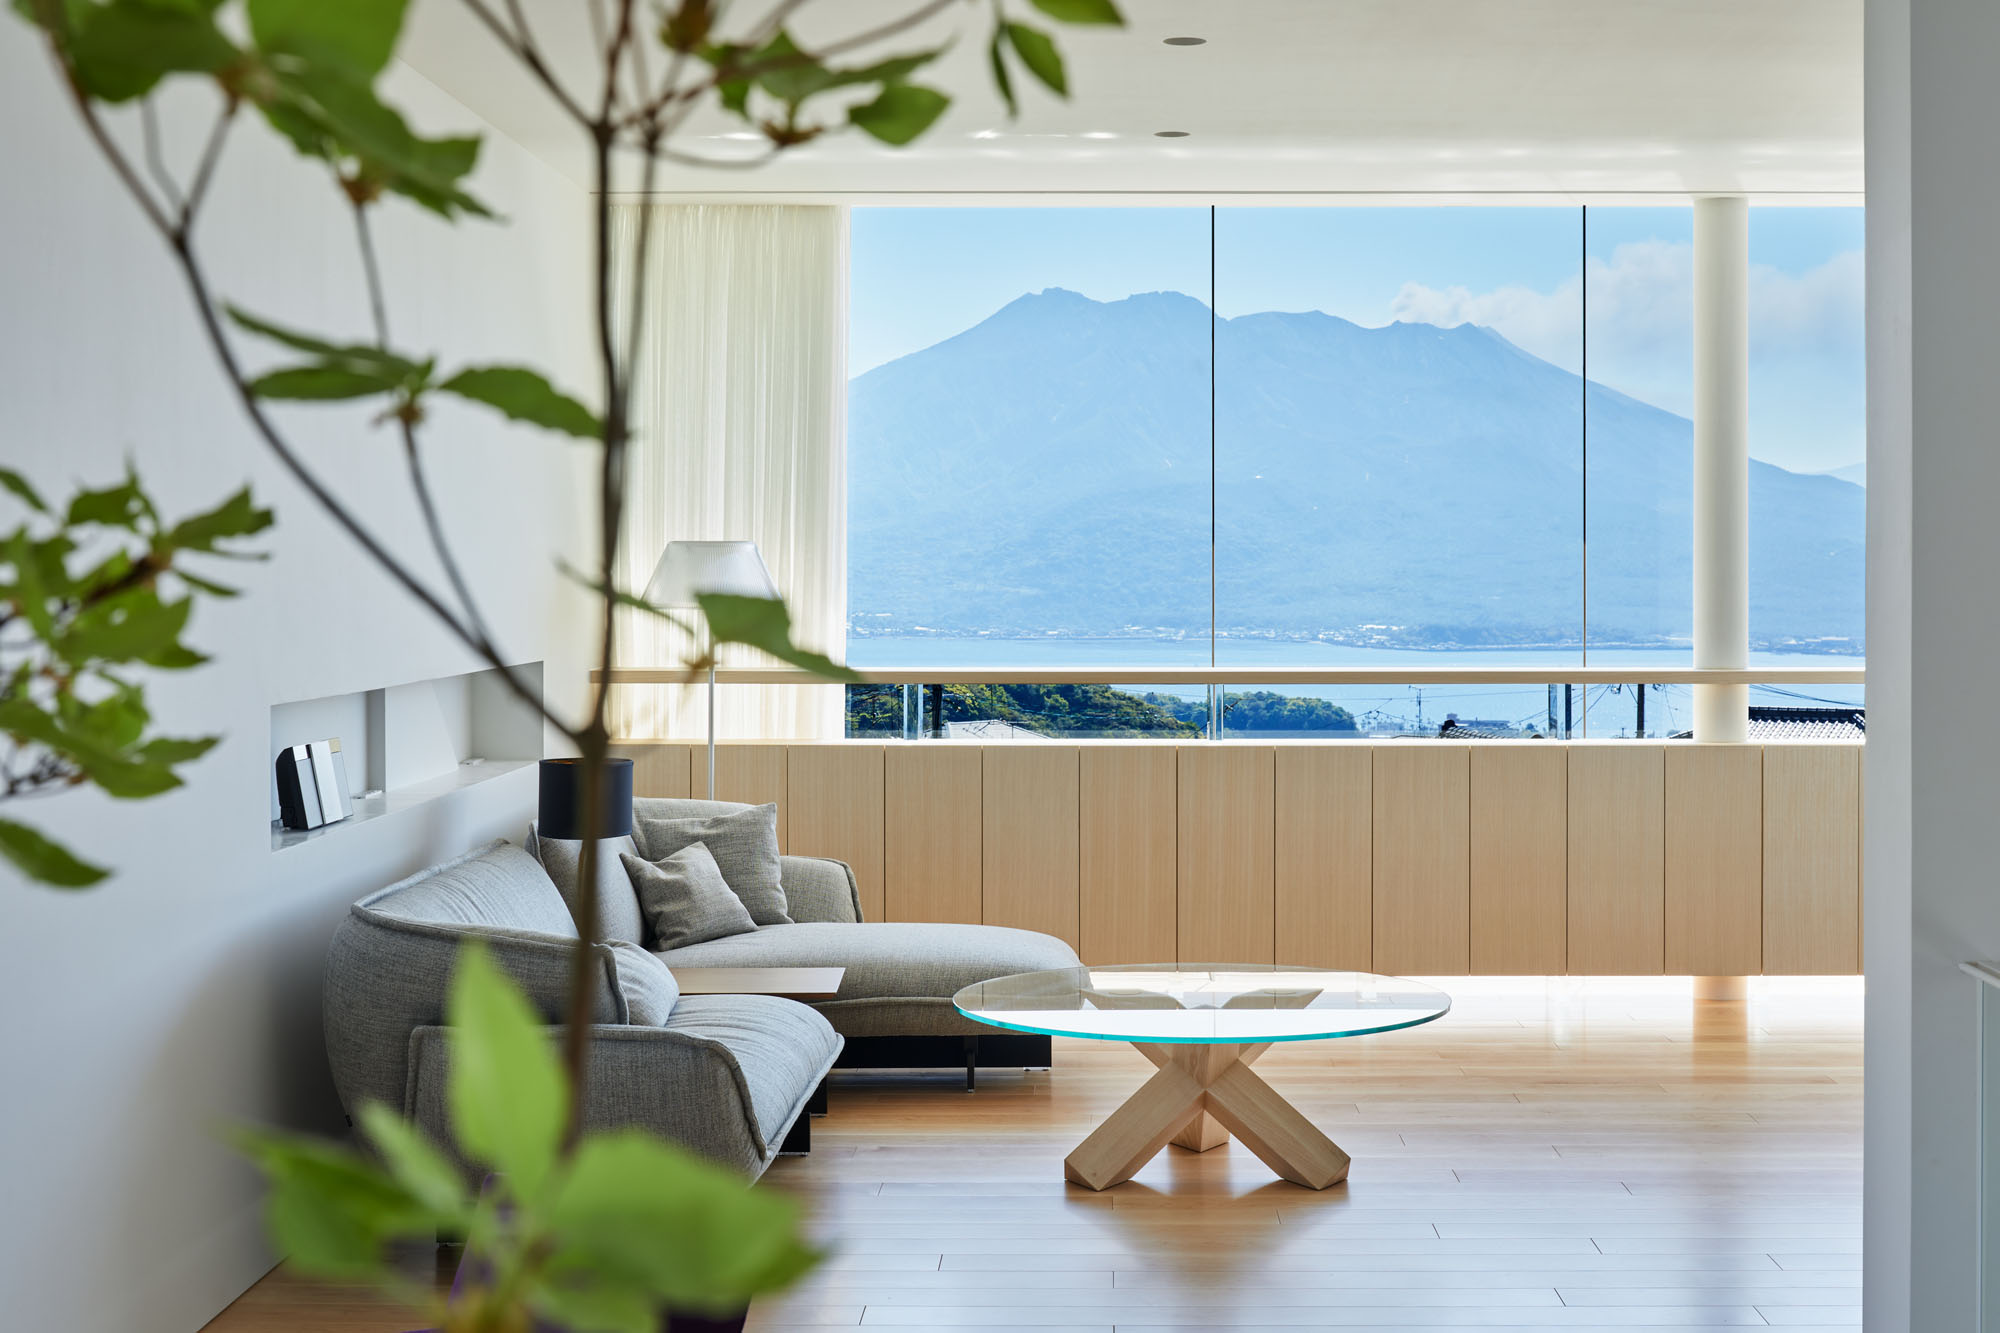 The view house of Sakurajima